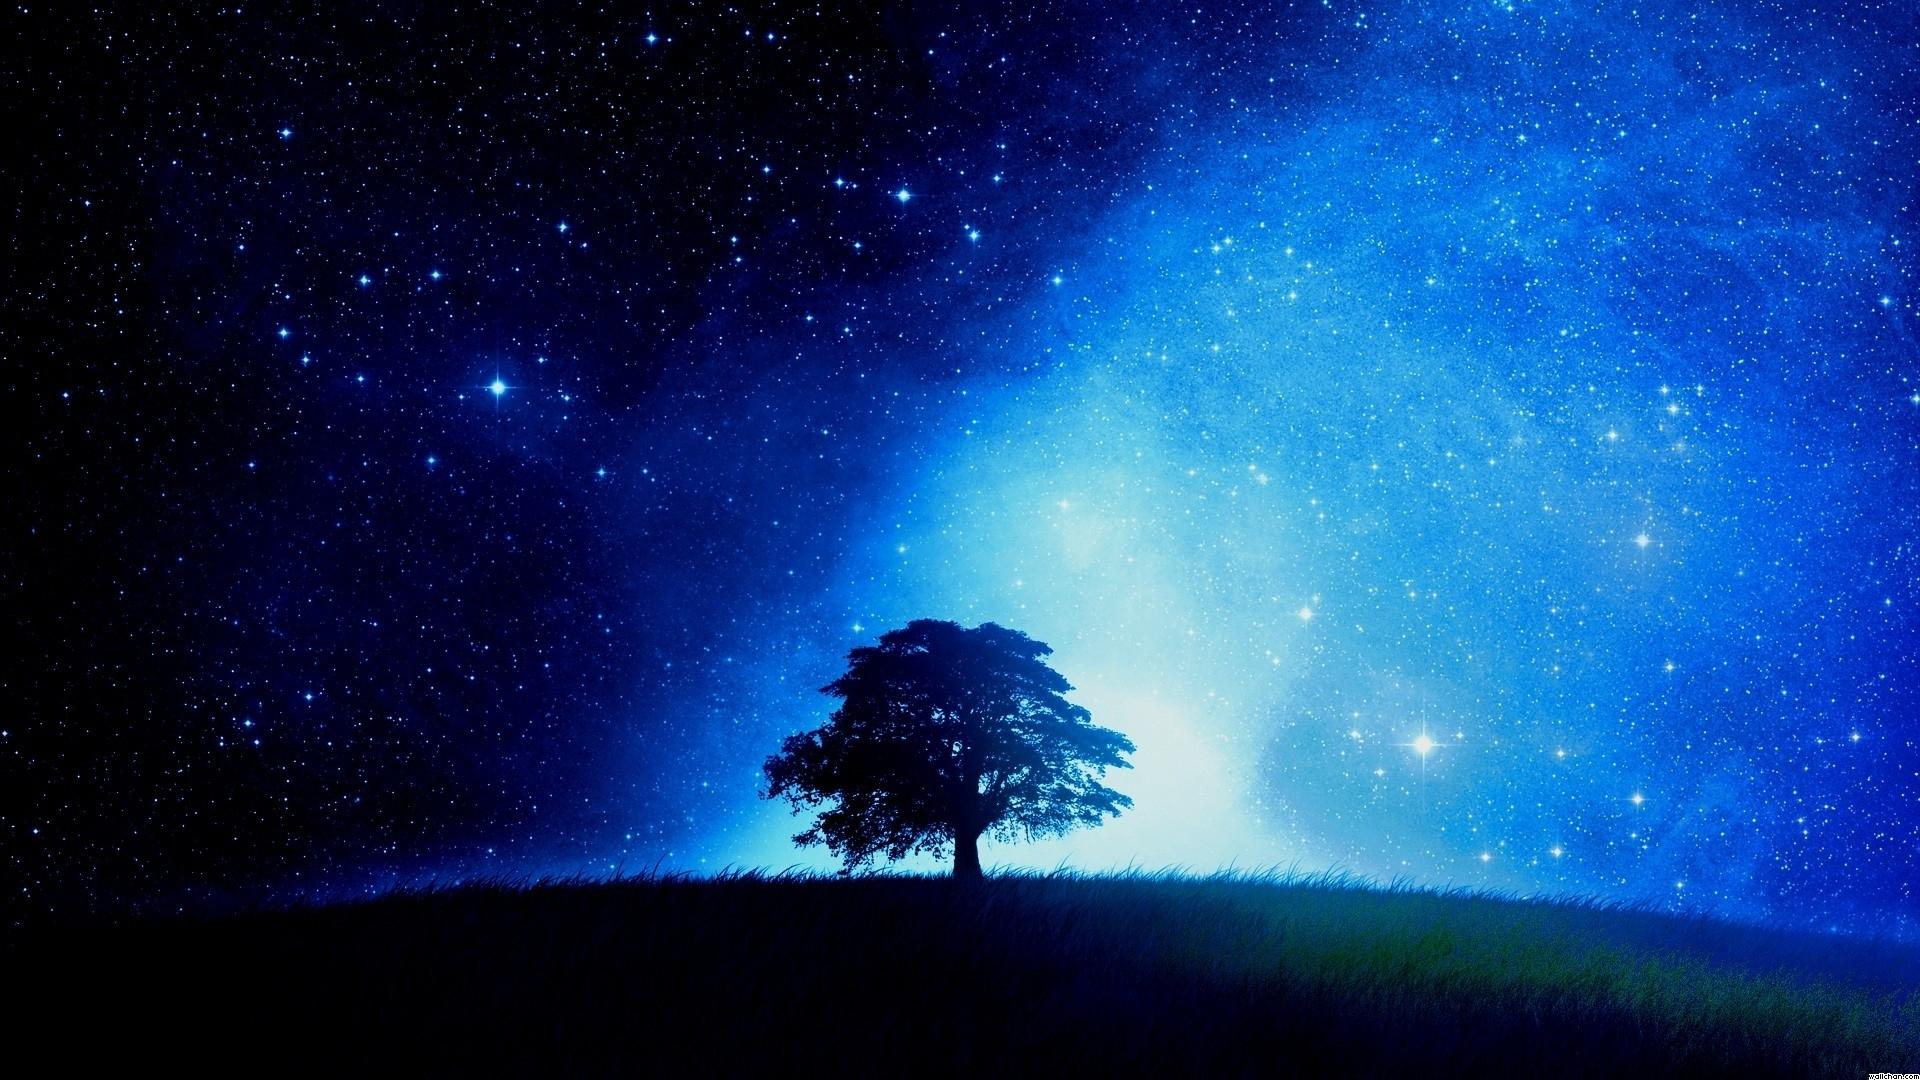 stars at night wallpaper (62+ images)